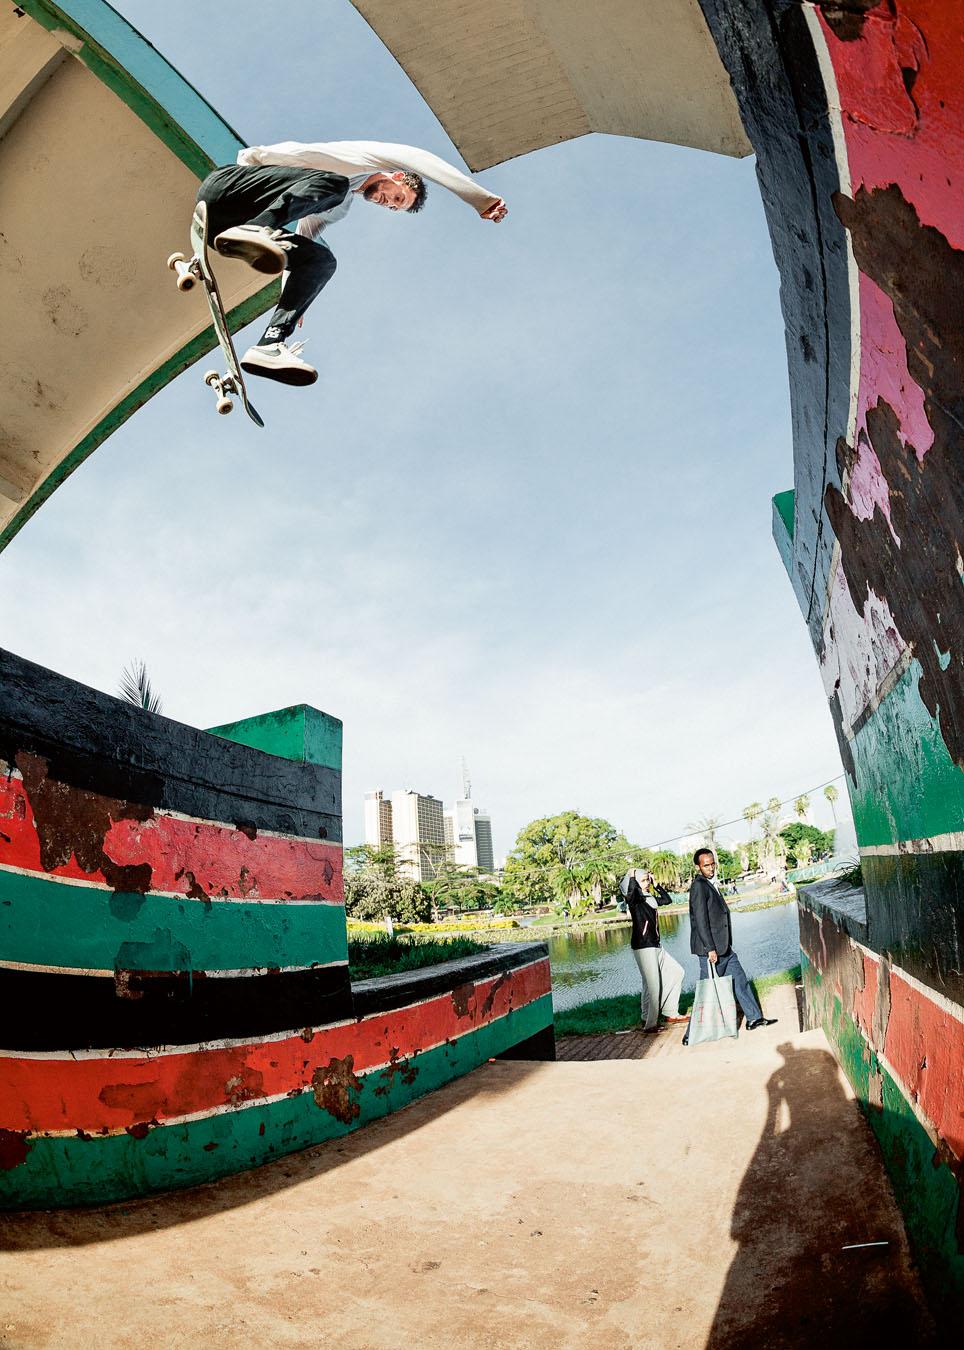 Michi backside flip Nairobi